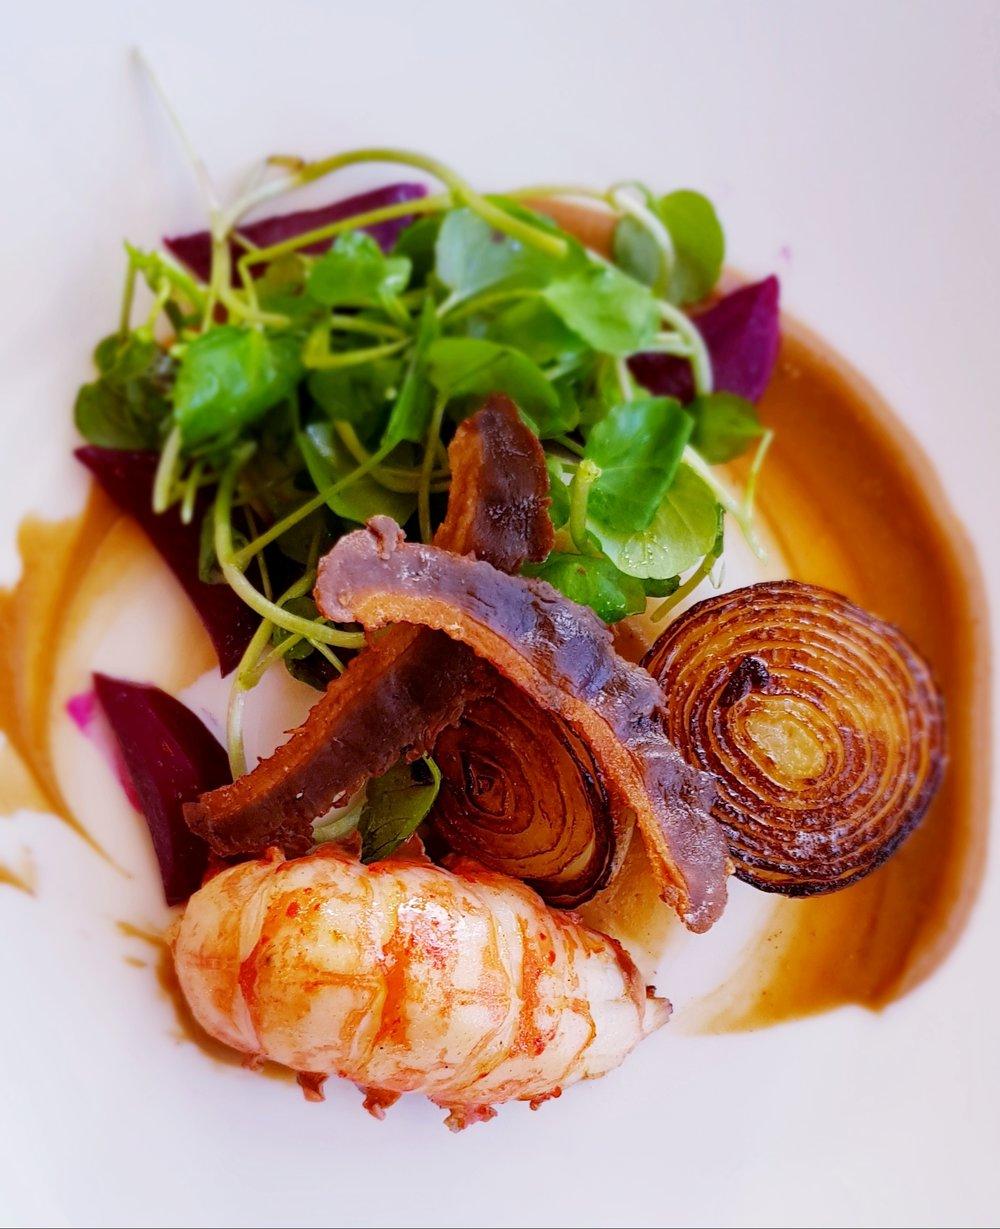 Sautéed West Australian Marron, Crispy Duck, Beetroot, Roasted Onion, Chestnut Puree and Watercress$35.00 - Availability: Lunch & Dinner